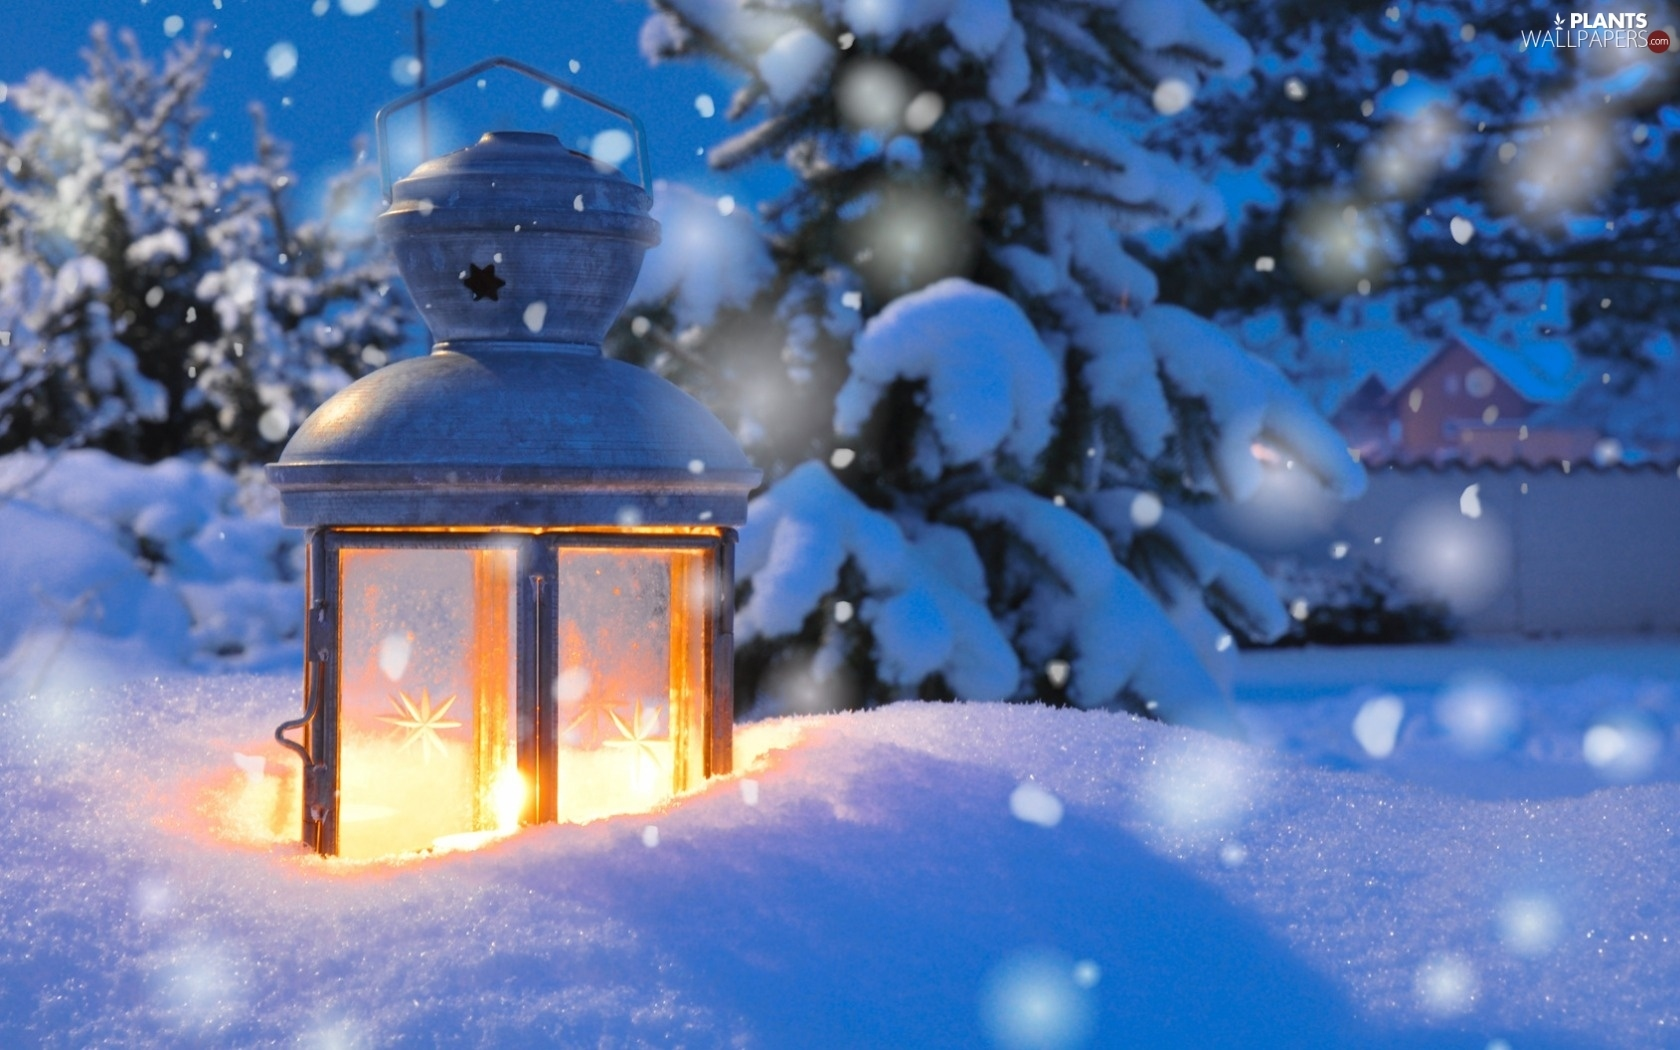 Snow Falling At Night Wallpaper Three Steps To Wisdom Chanmadhavi S Blog